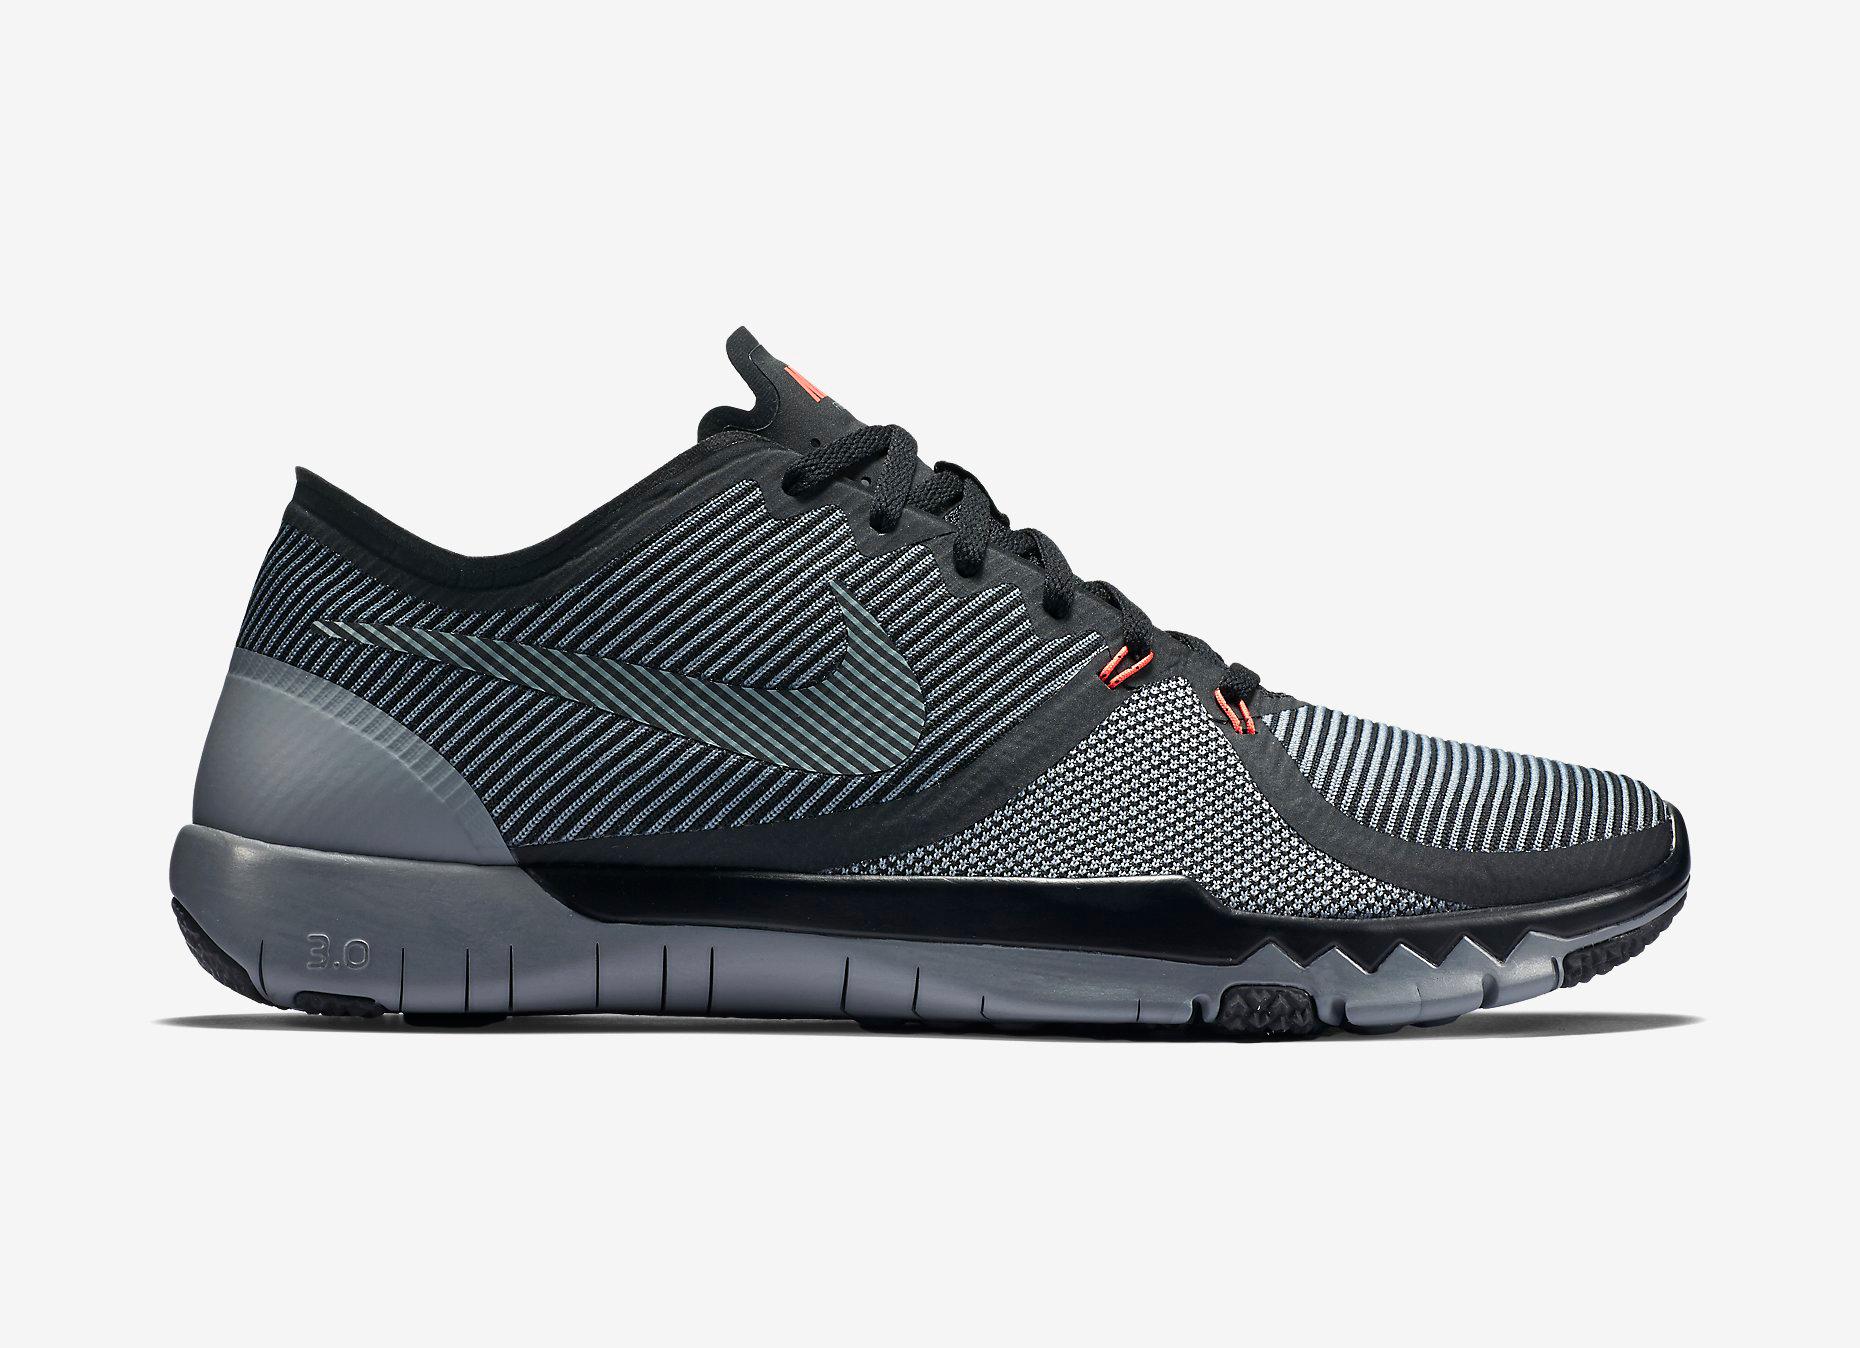 New Mens Nike Free Trainer   V Run Running Shoes